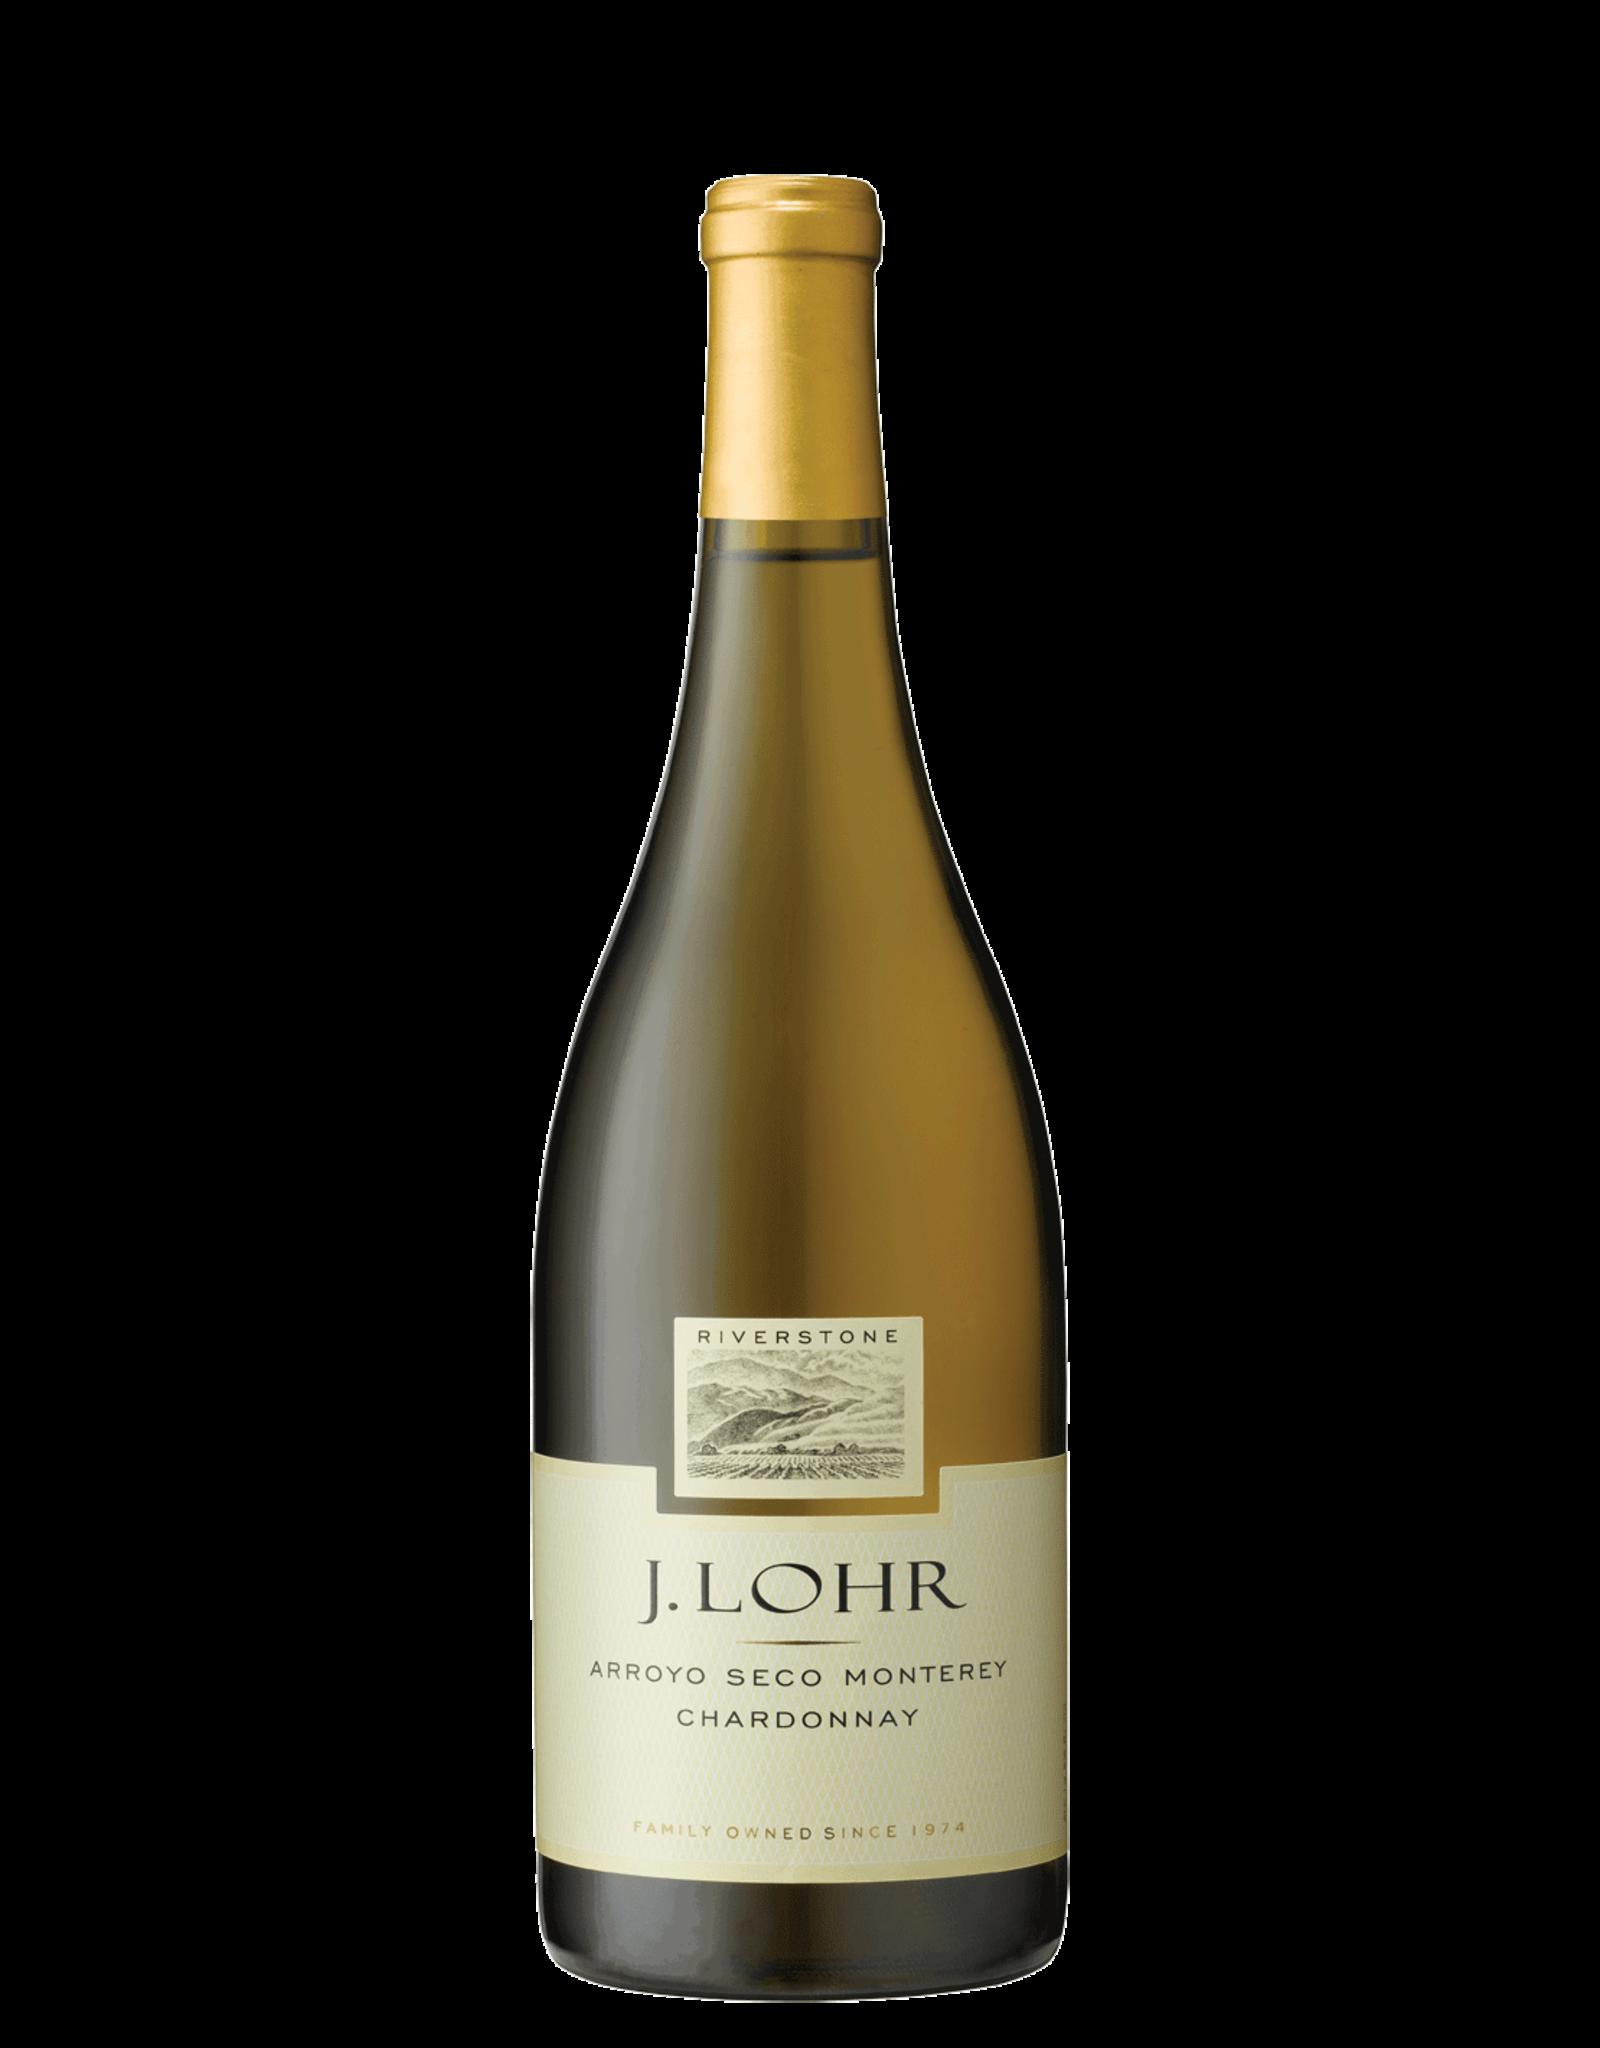 J. Lohr J. Lohr Riverstone Chardonnay